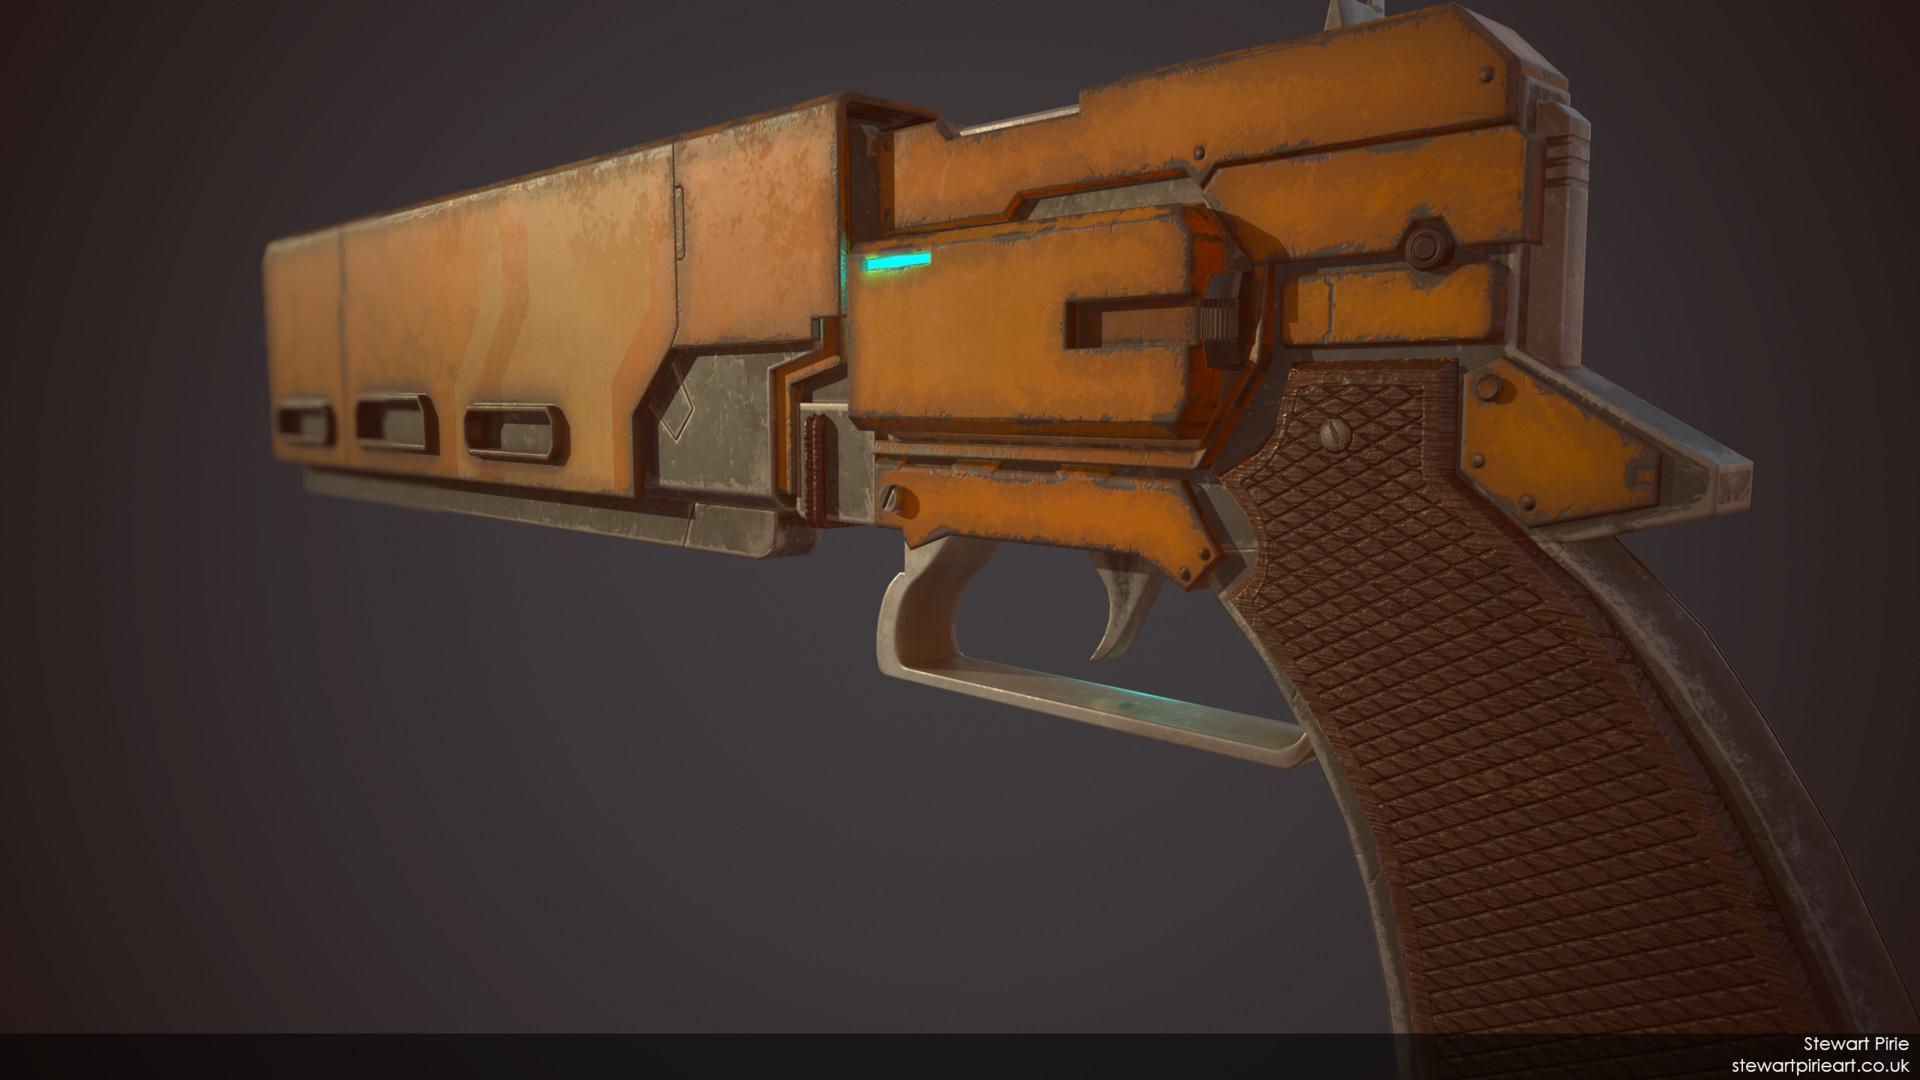 Stewart pirie gun shot 01